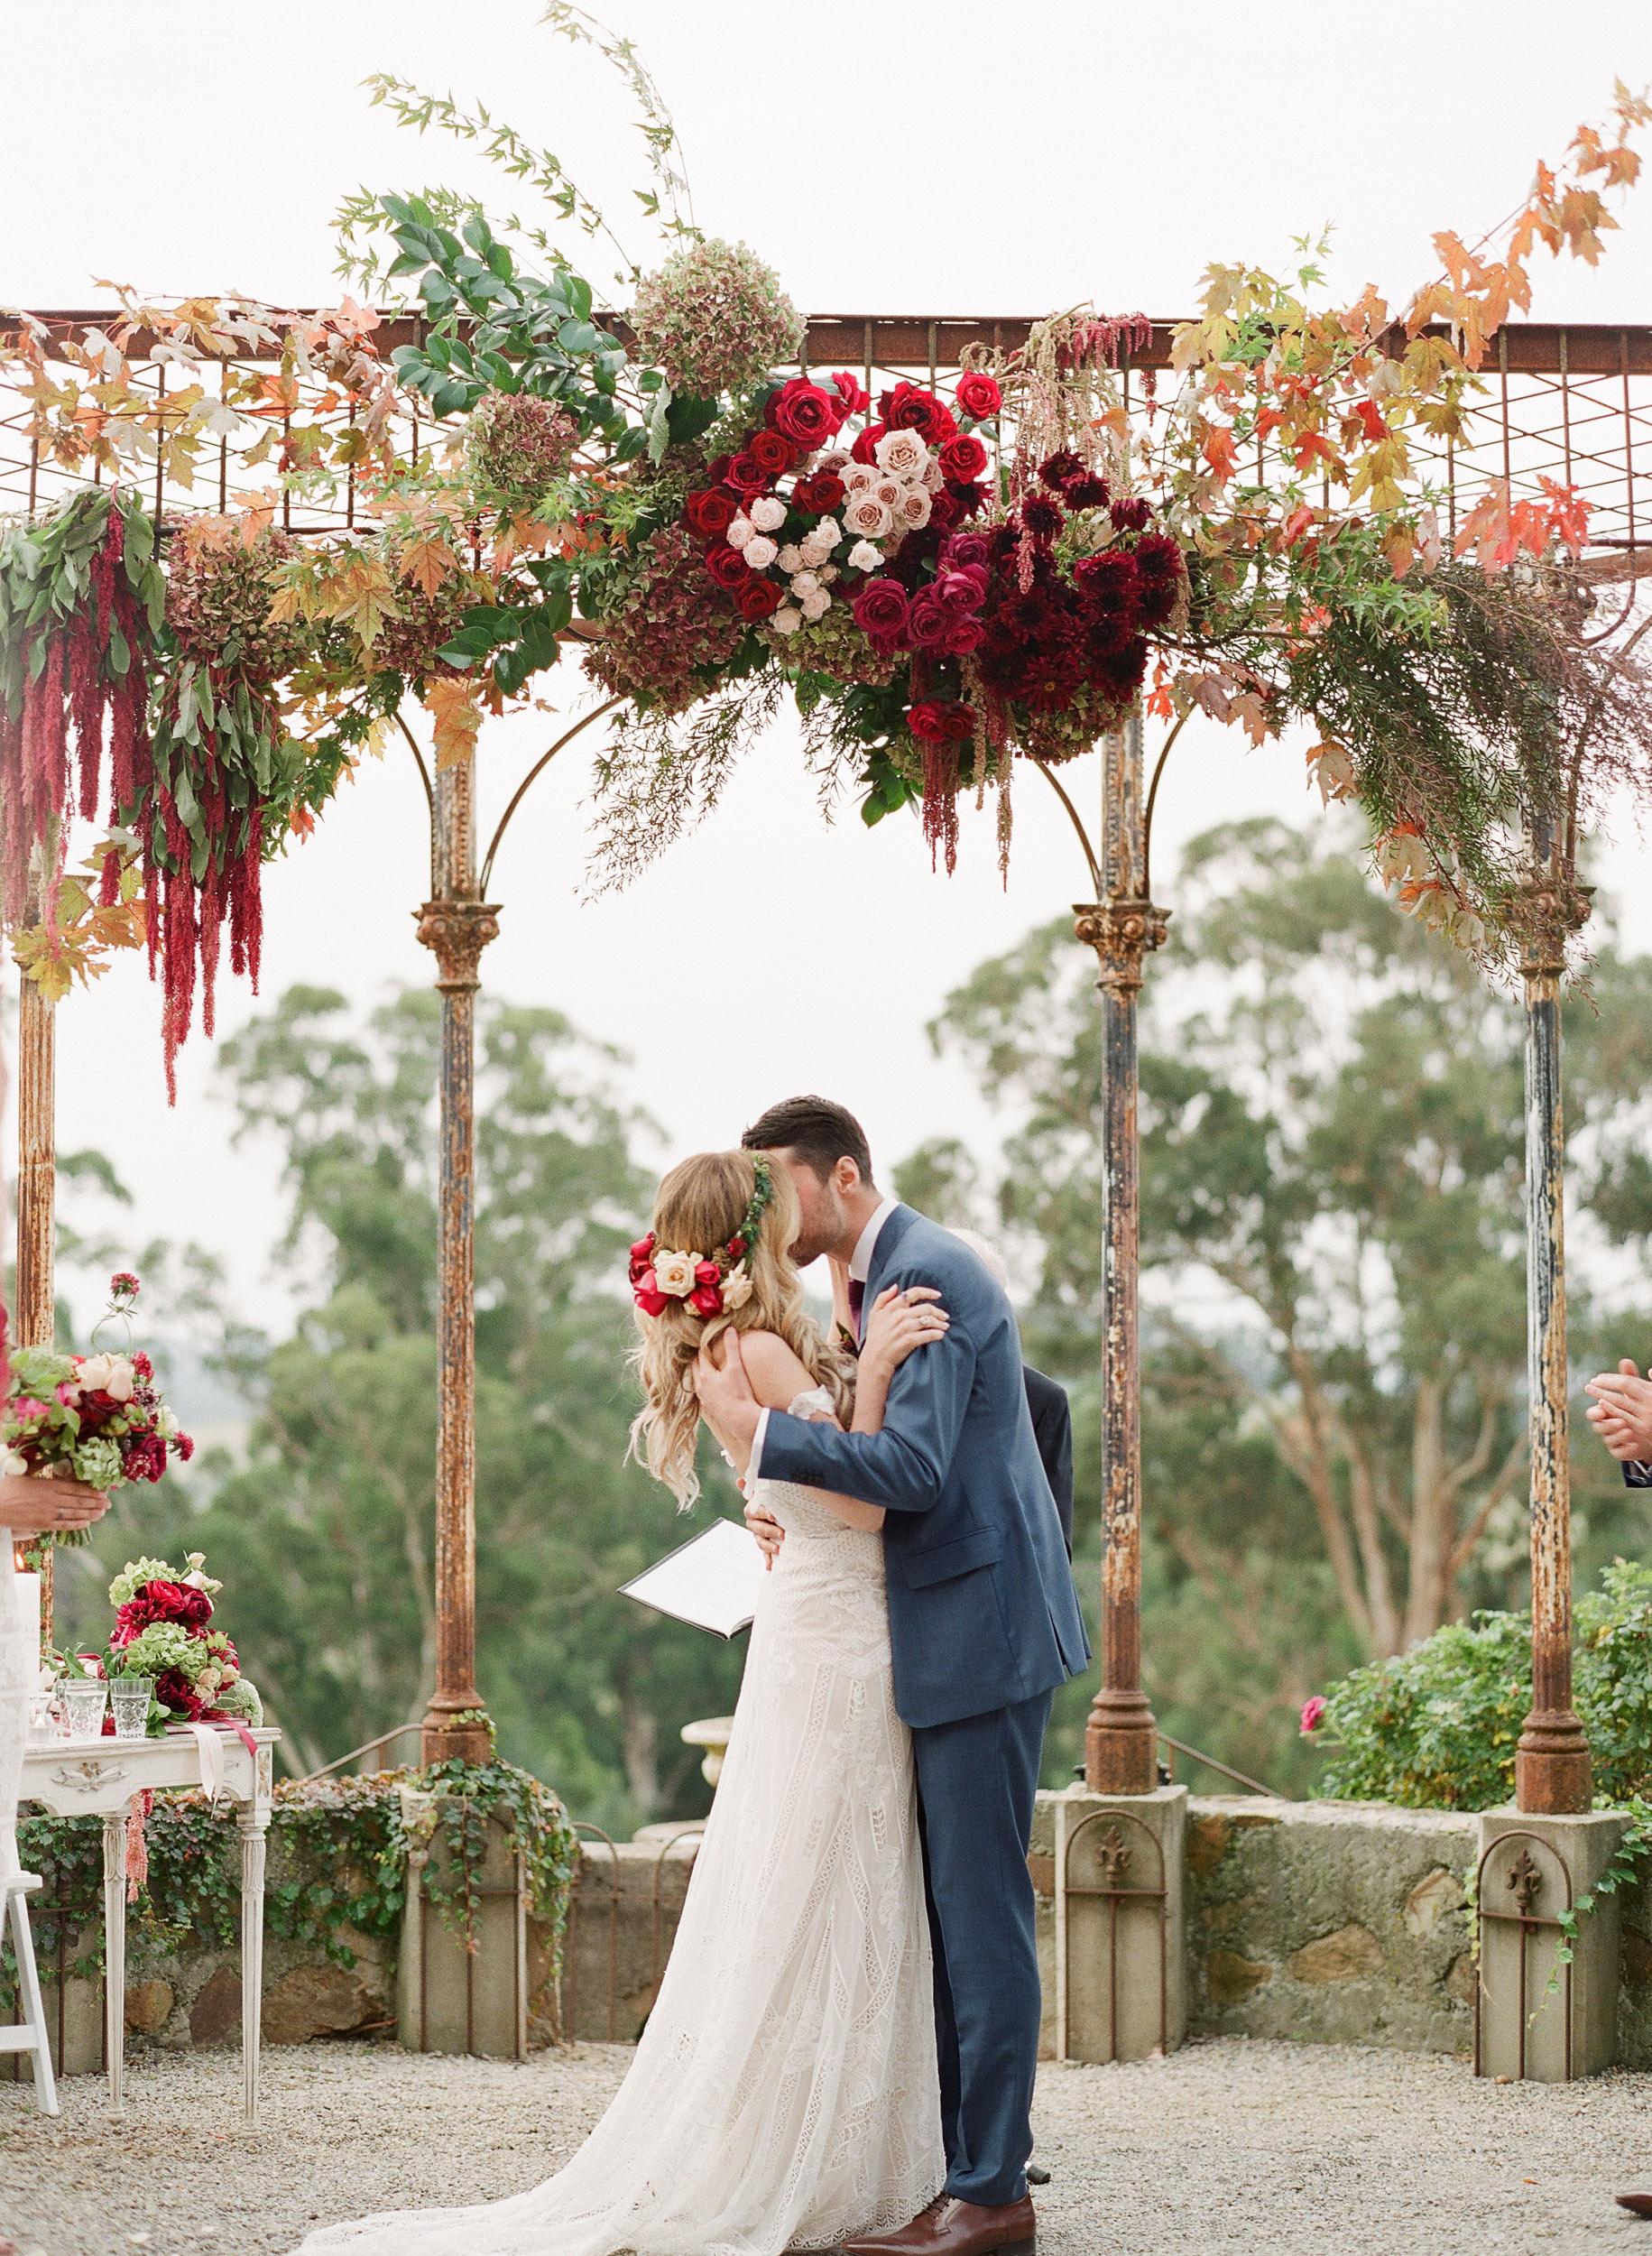 wedding (16 of 24) - 000098110006.jpg